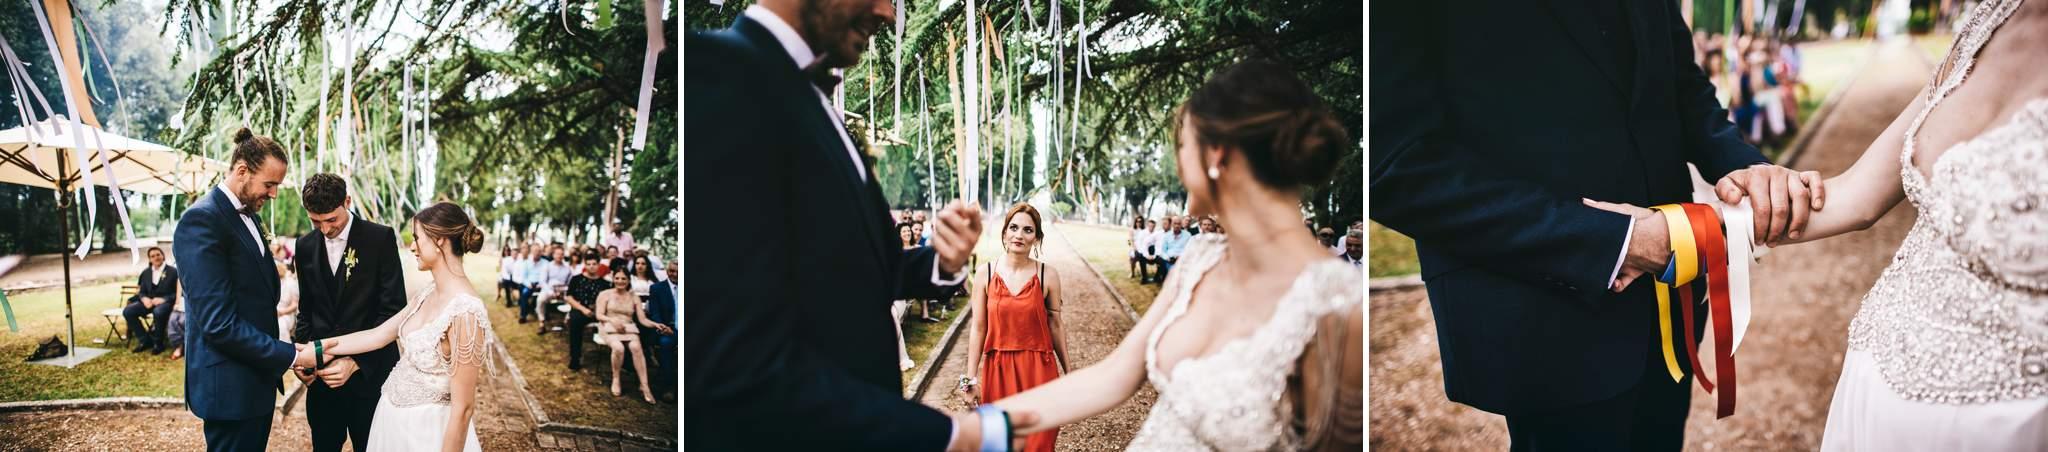 17wedding-photographer-villa-petrolo